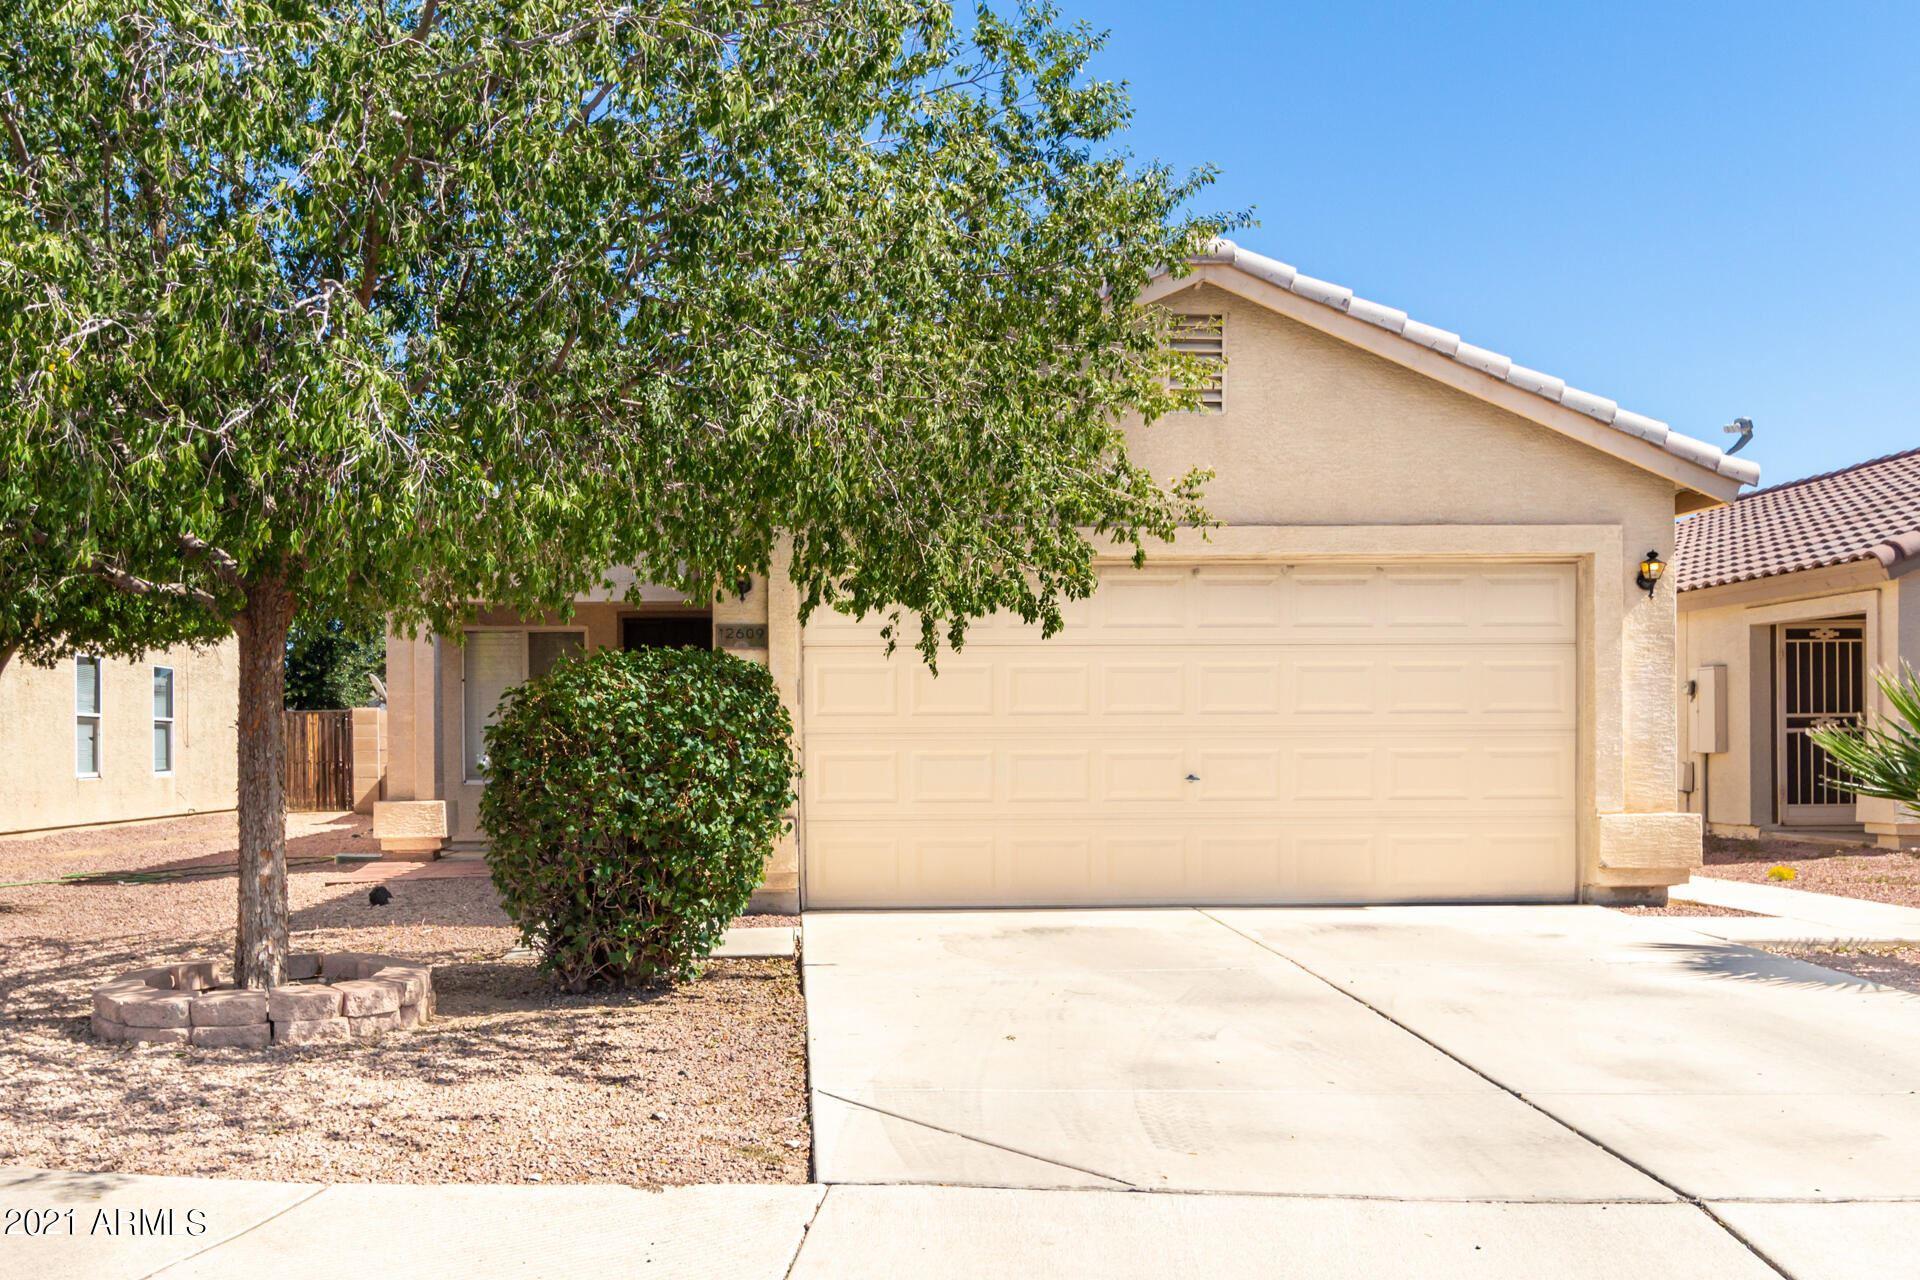 Photo of 12609 N EL FRIO Street, El Mirage, AZ 85335 (MLS # 6307696)